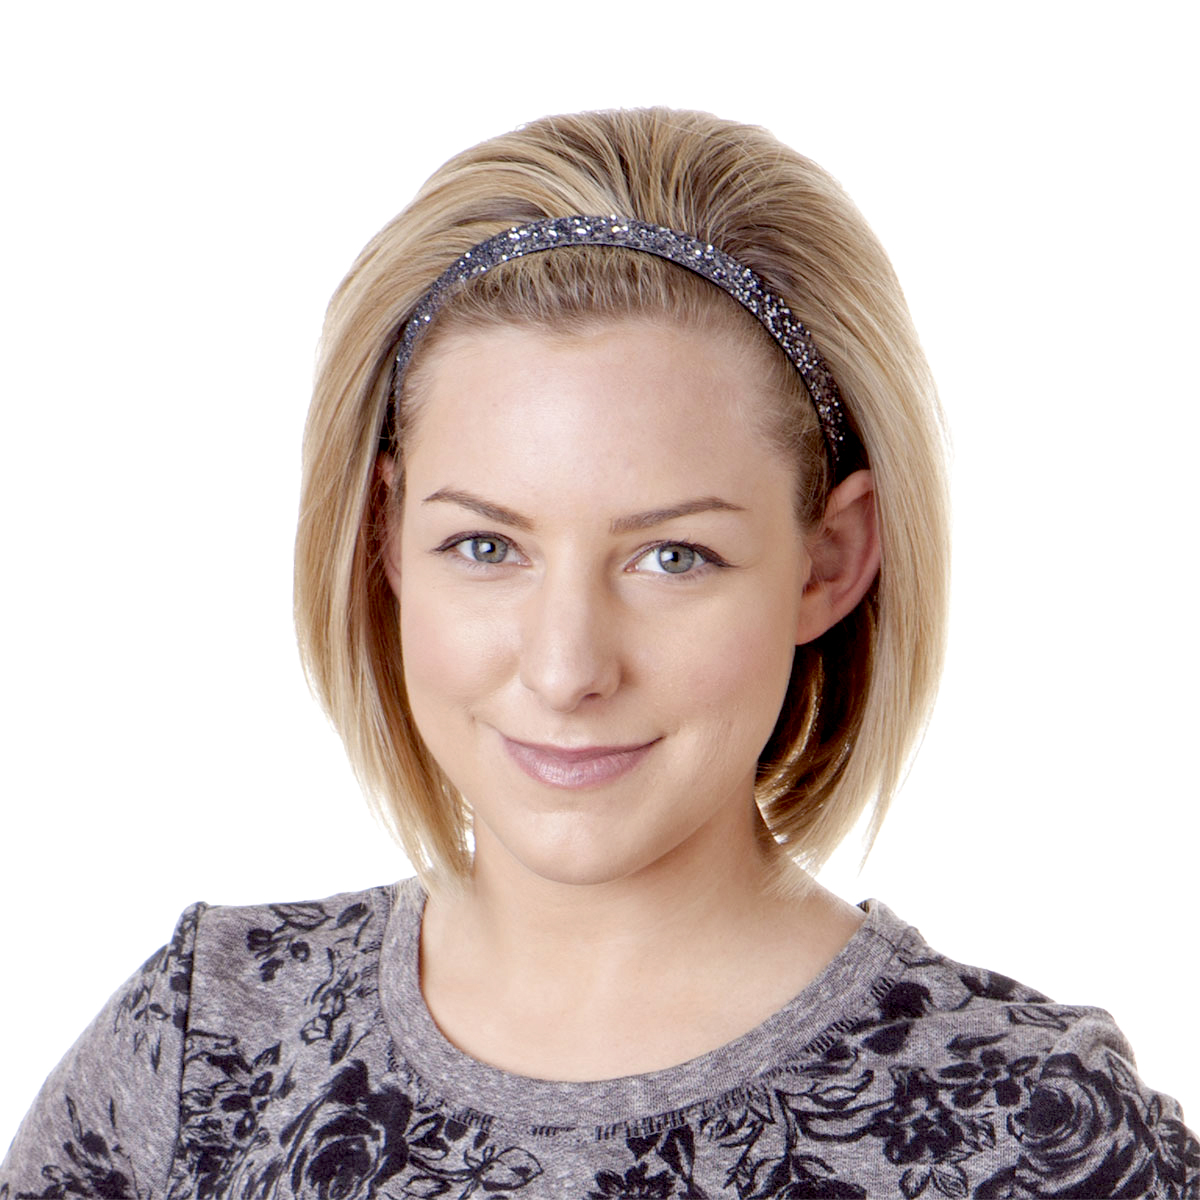 Hipsy Women's Adjustable NO SLIP Skinny Bling Glitter Headband (Gunmetal)